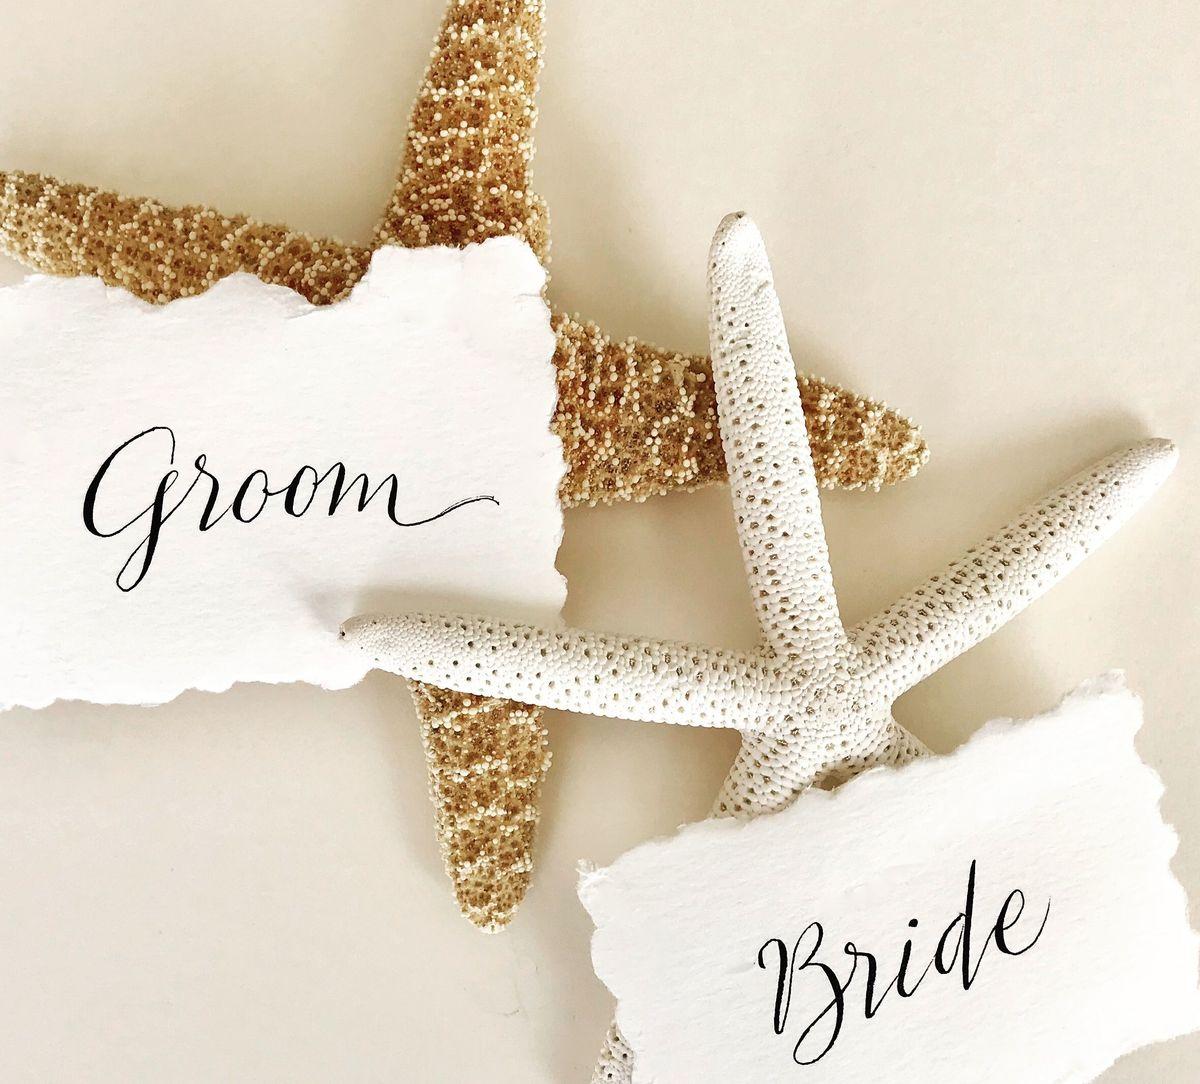 Destin Wedding Invitations - Reviews for Invitations